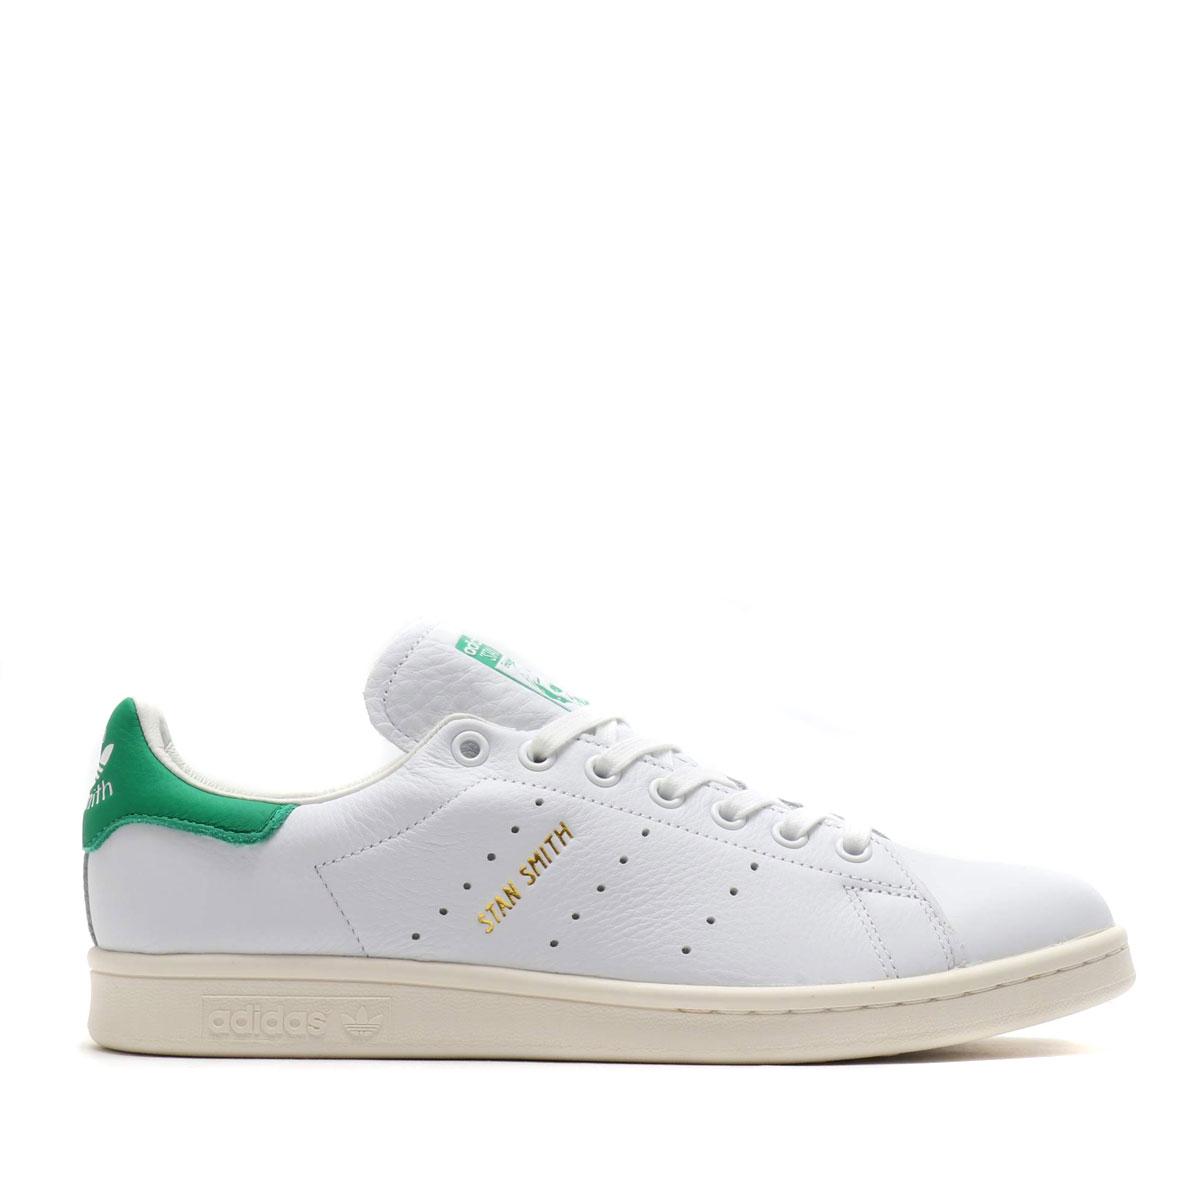 adidas Originals STAN SMITH FOREVER(RUNNING WHITE/RUNNING WHITE/GREEN)(アディダスオリジナルス スタンスミス フォーエバー)【メンズ】【レディース】【スニーカー】【19SS-S】